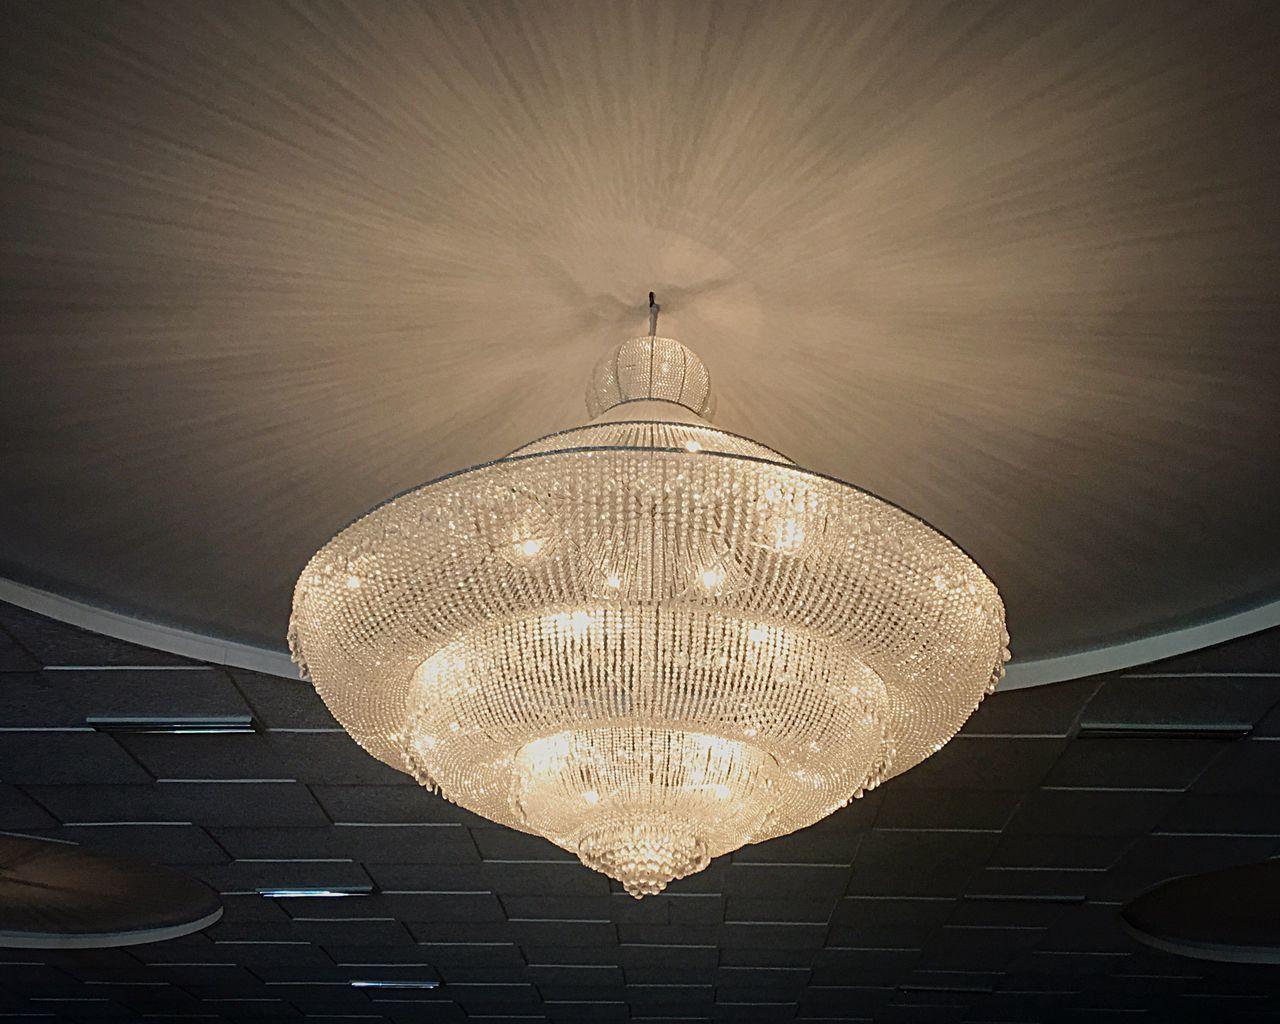 Light Illuminated Chandelier BIG Lux Luxury